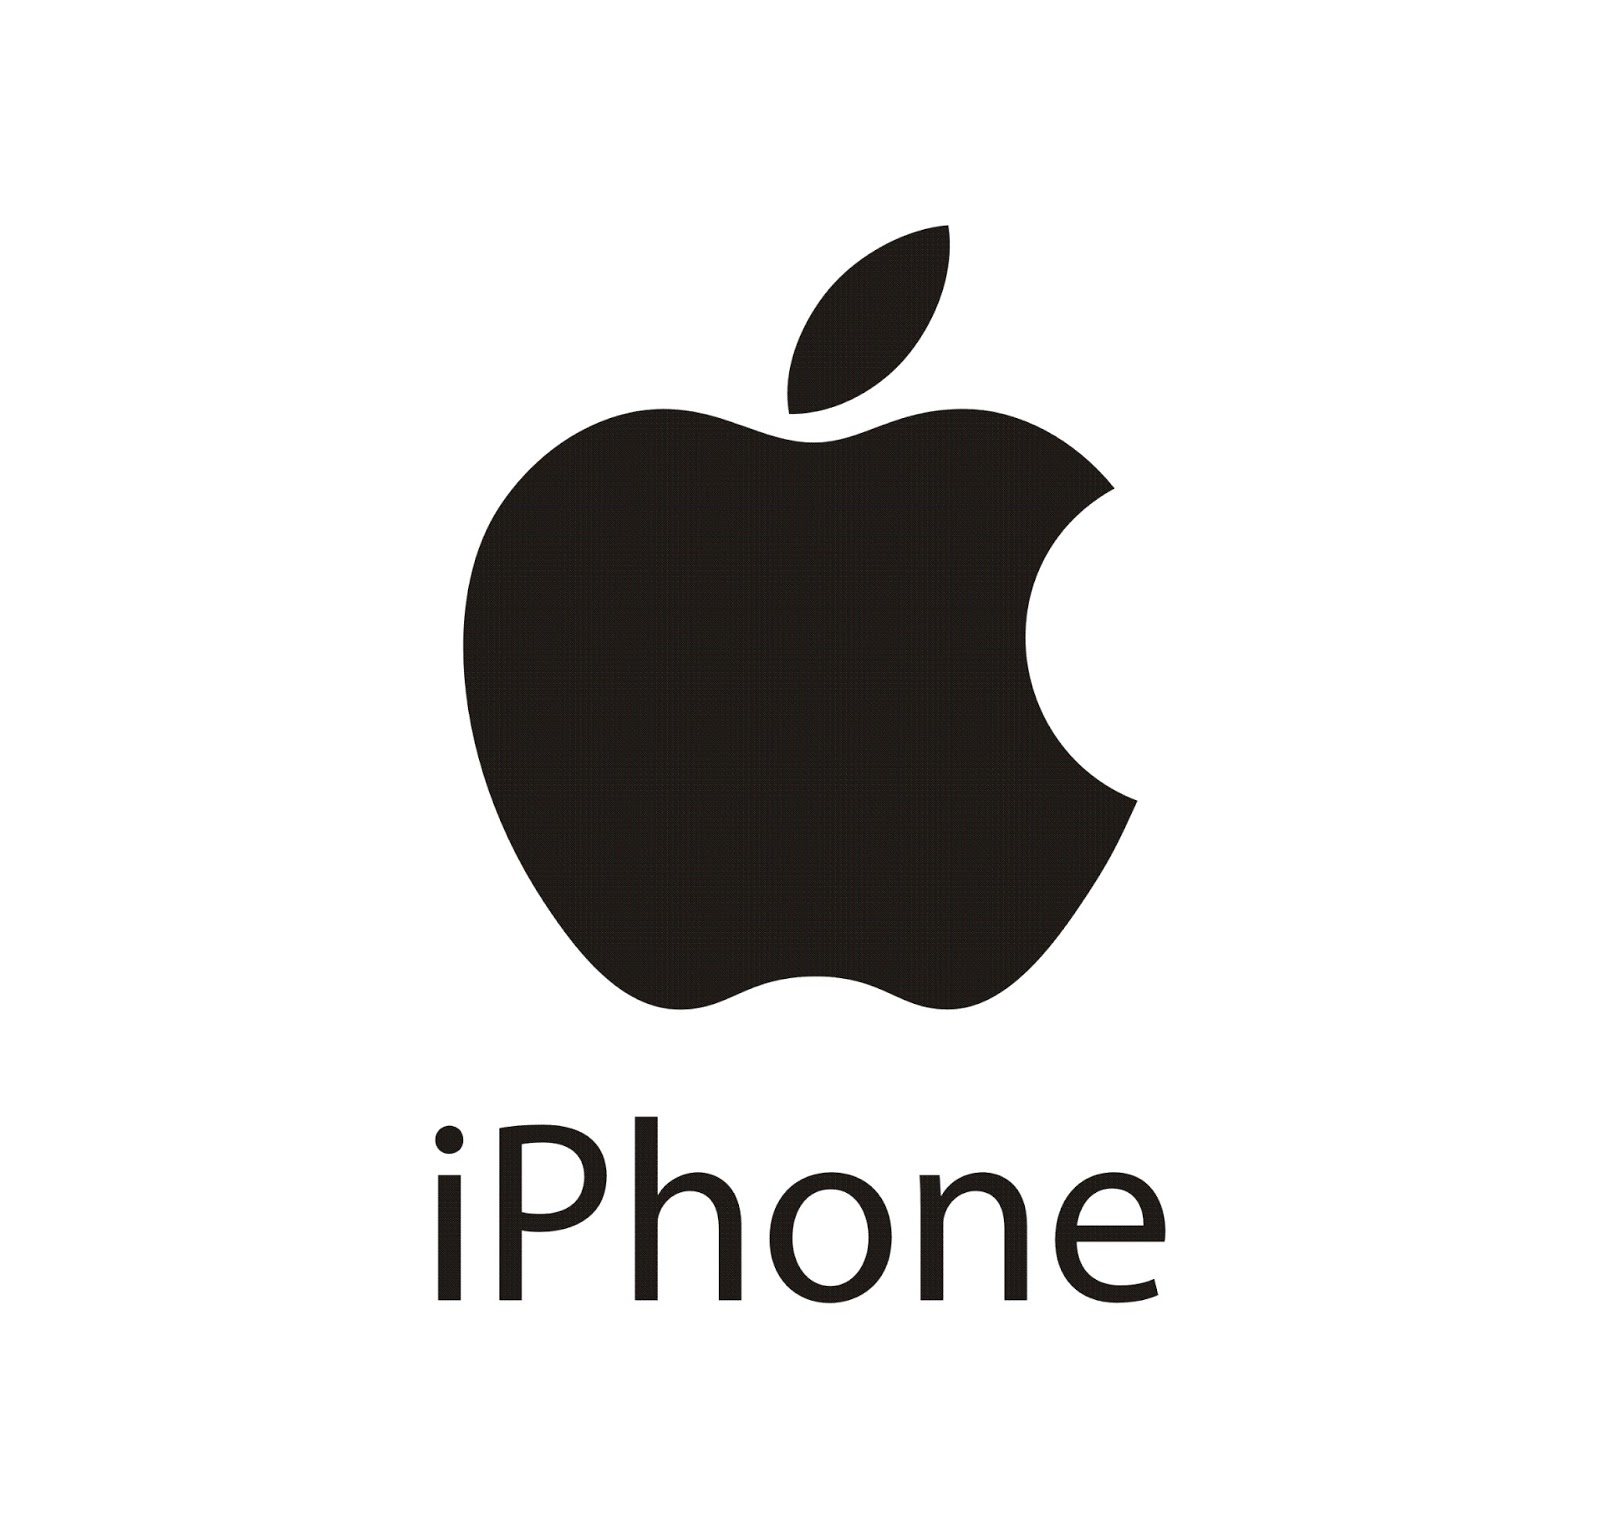 Apple iPhone Logo Vector